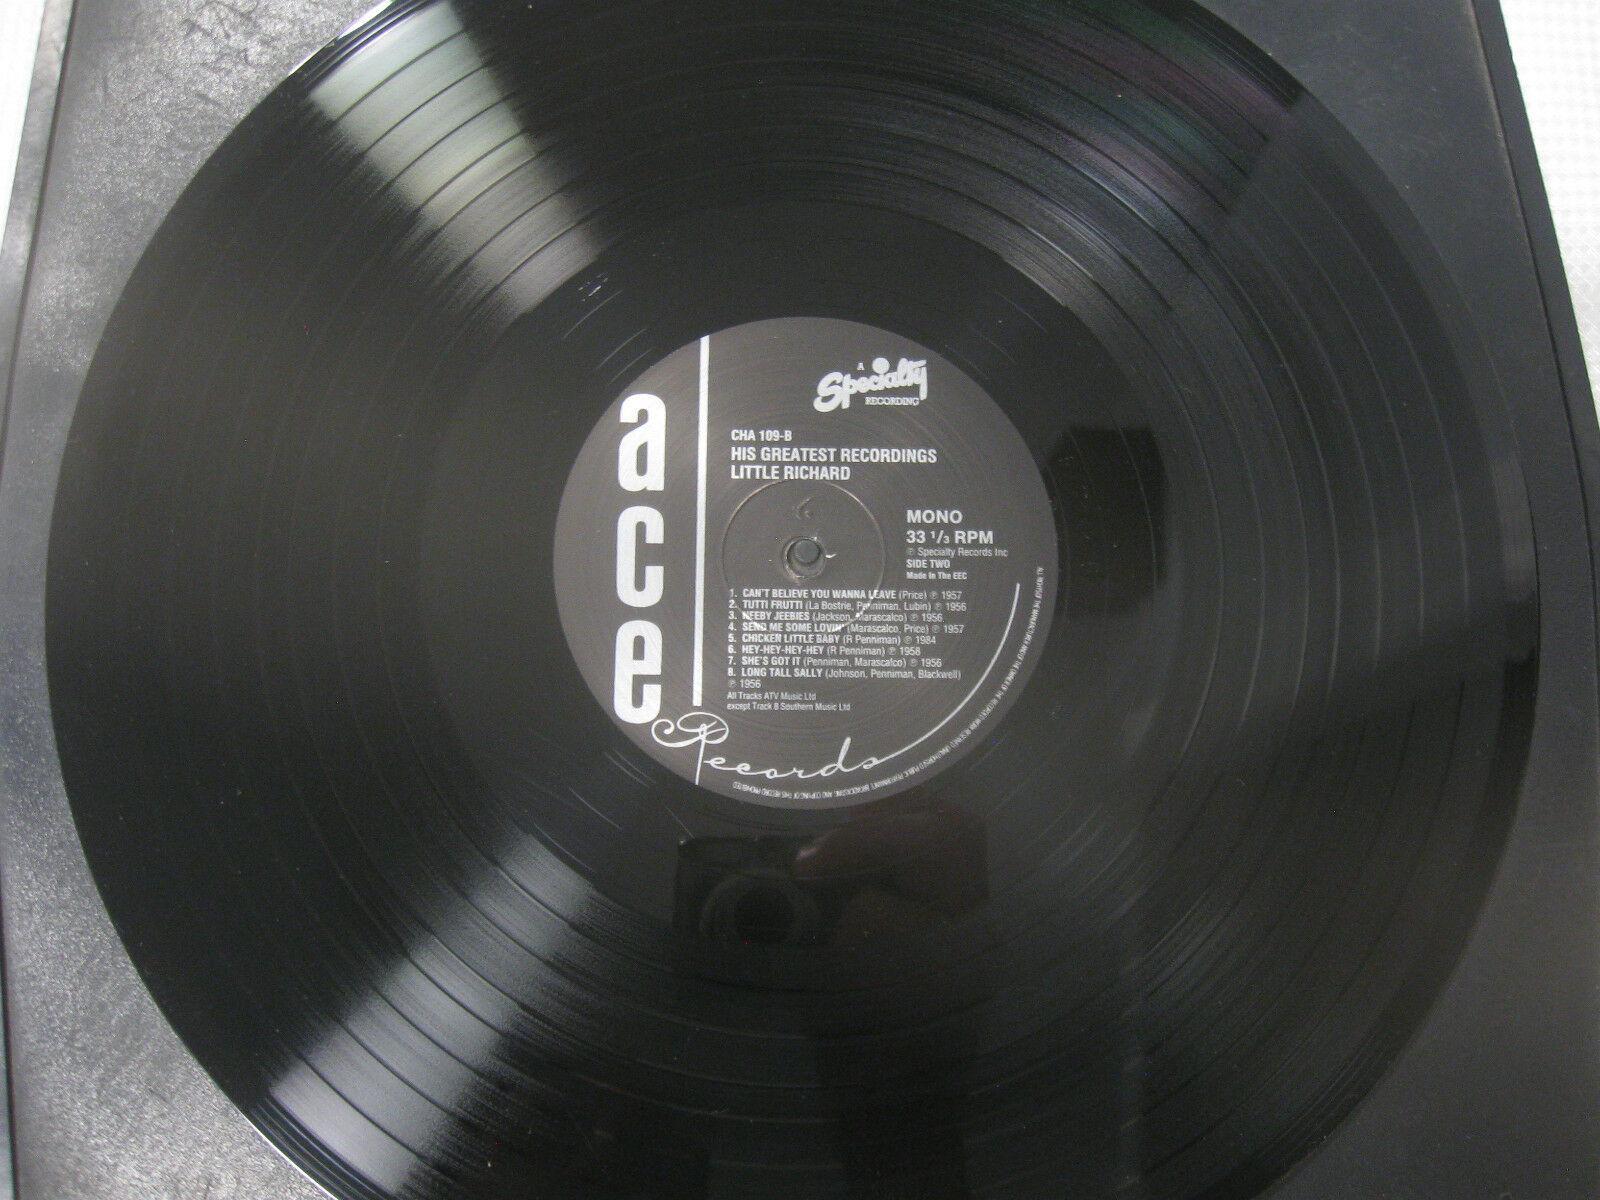 Little Richard His Greatest Recordings Ace CHA 109 Mono LP Record Album UK Press image 8